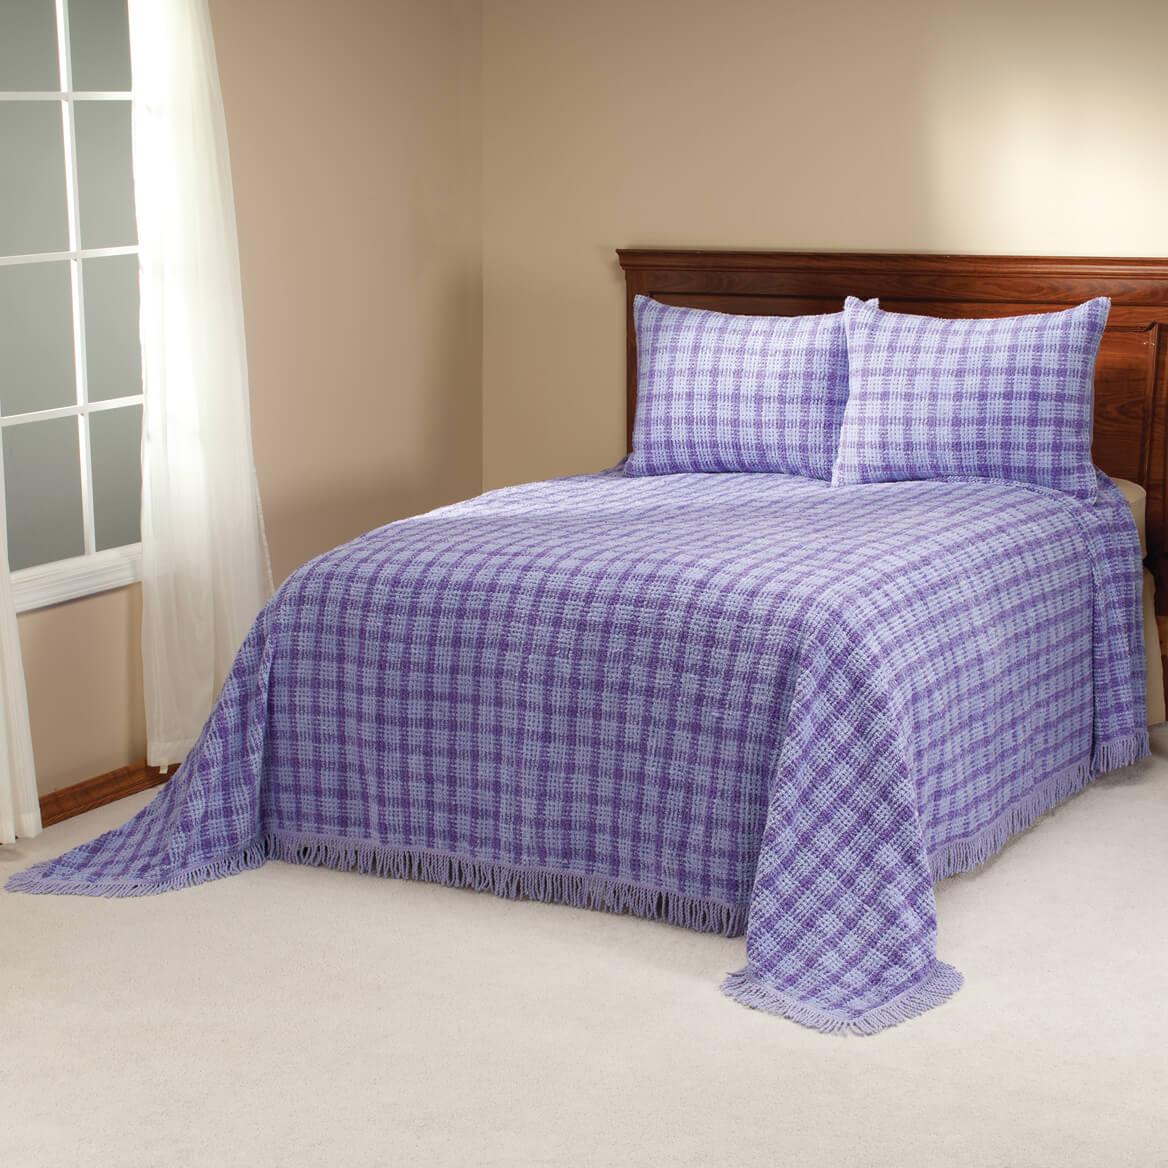 The-Katherine-Chenille-Bedspread-by-OakRidgeTM thumbnail 20